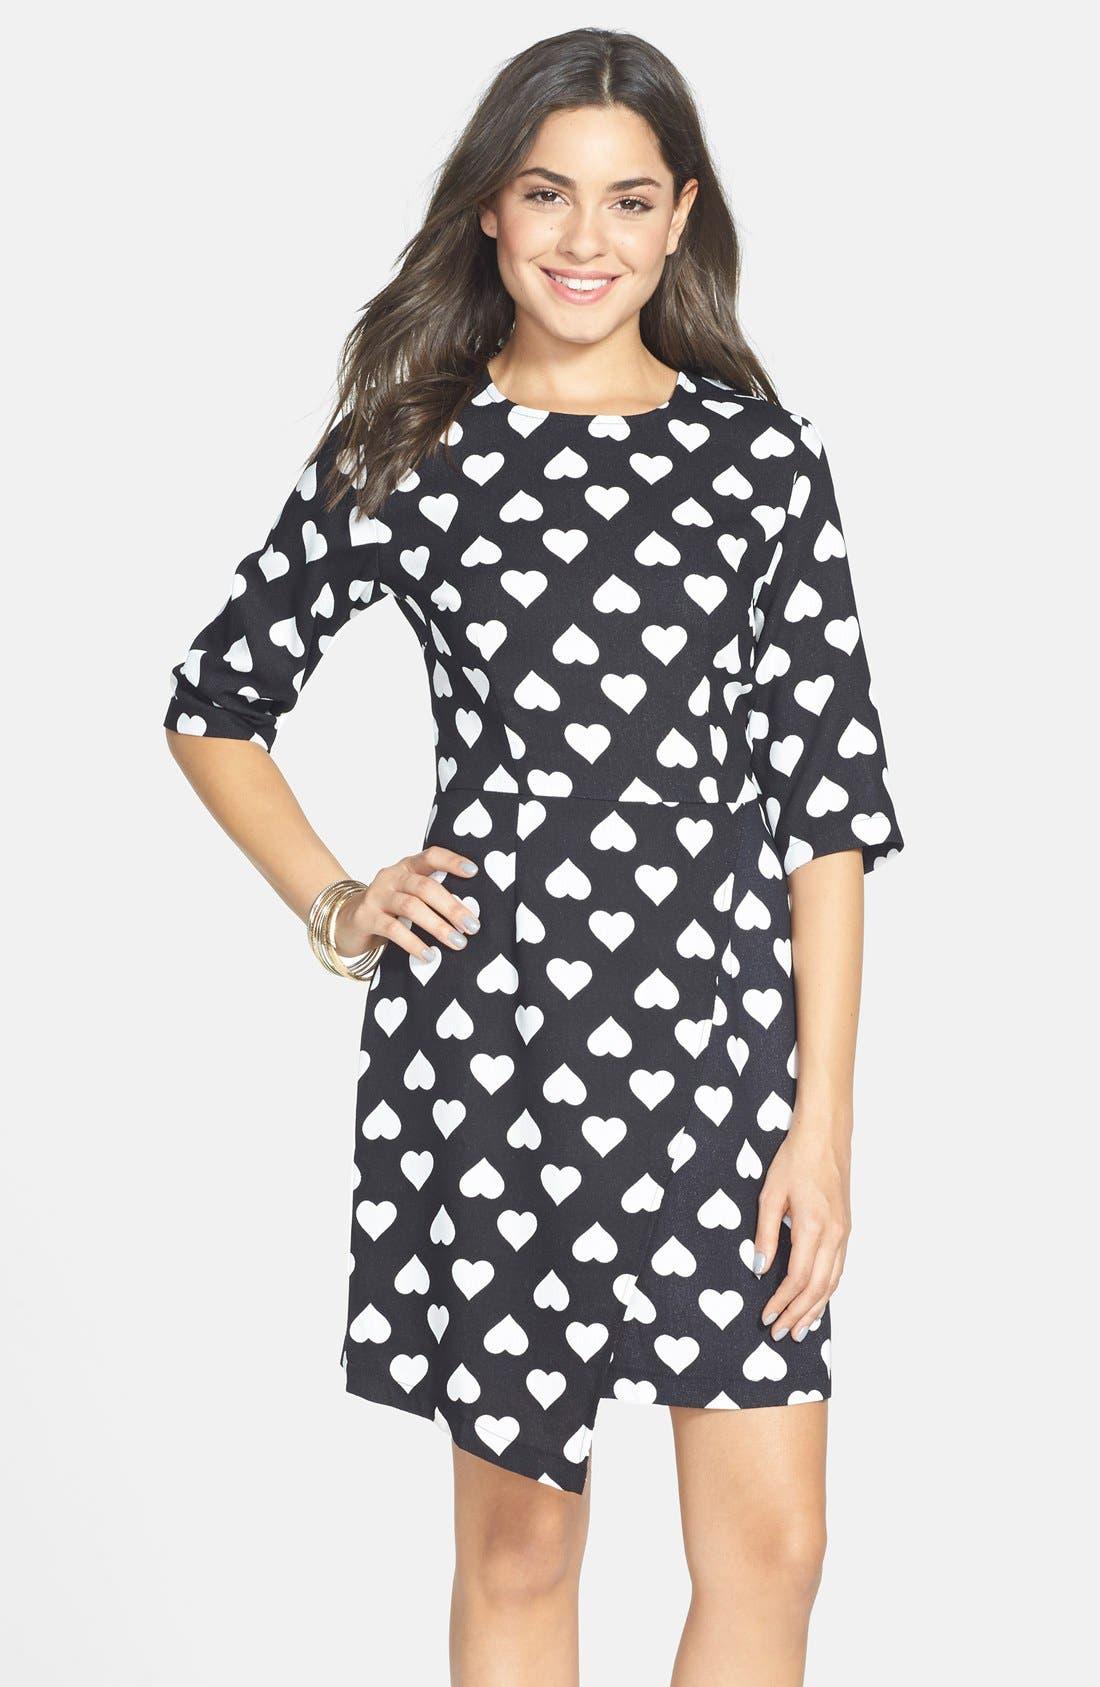 POPPY LUX, 'Nancy' Heart Print Asymmetrical Dress, Alternate thumbnail 5, color, 001